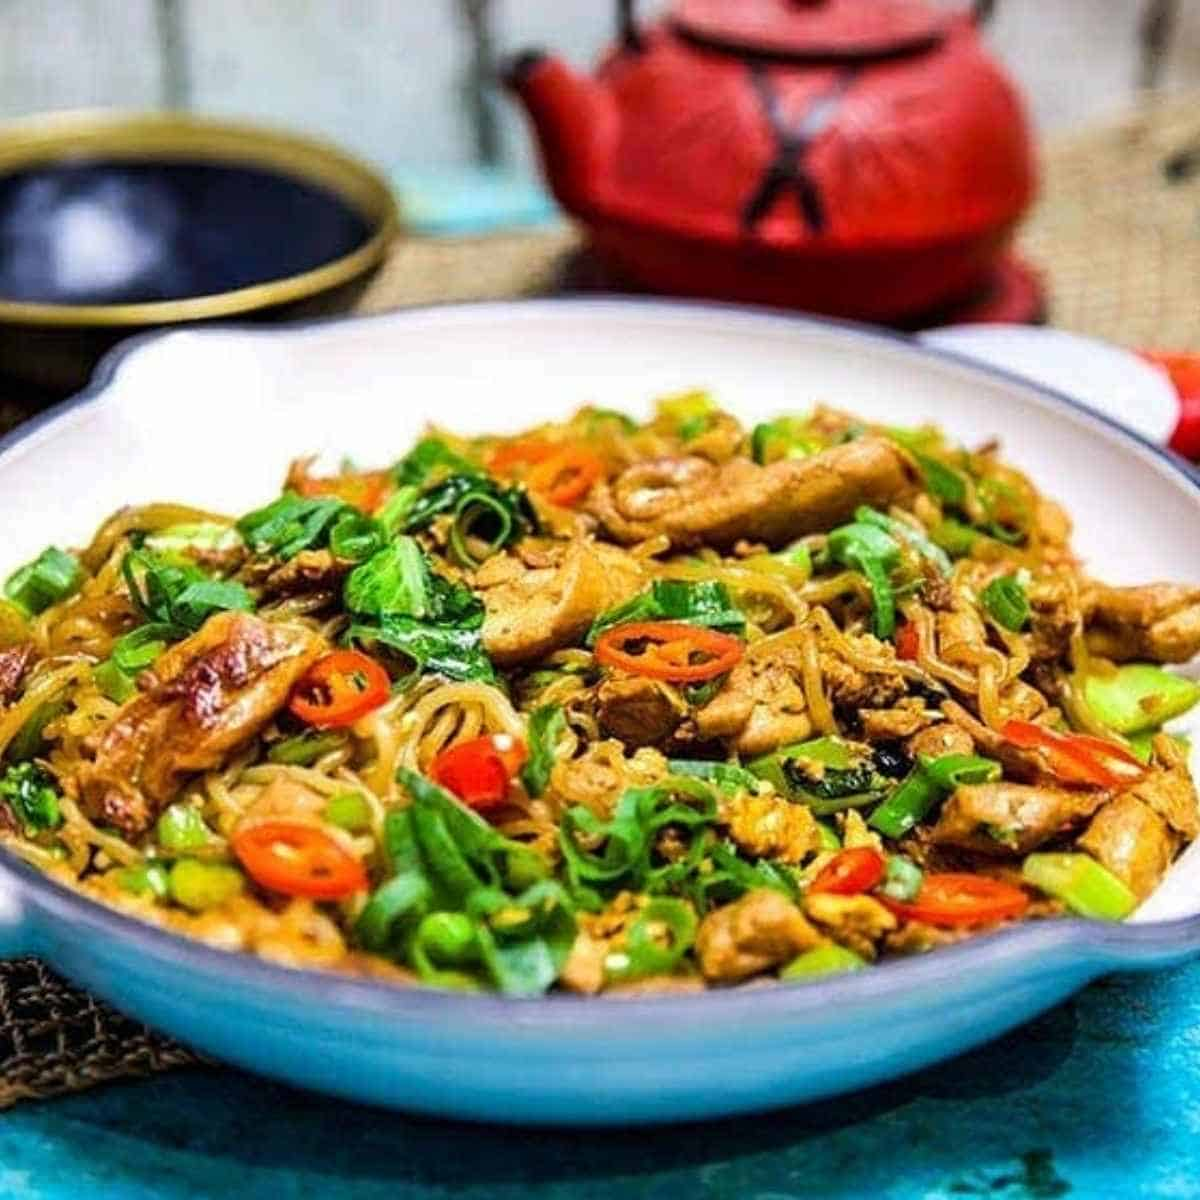 Chicken pad see ew - Shirataki: The True Keto Approved Asian Noodle